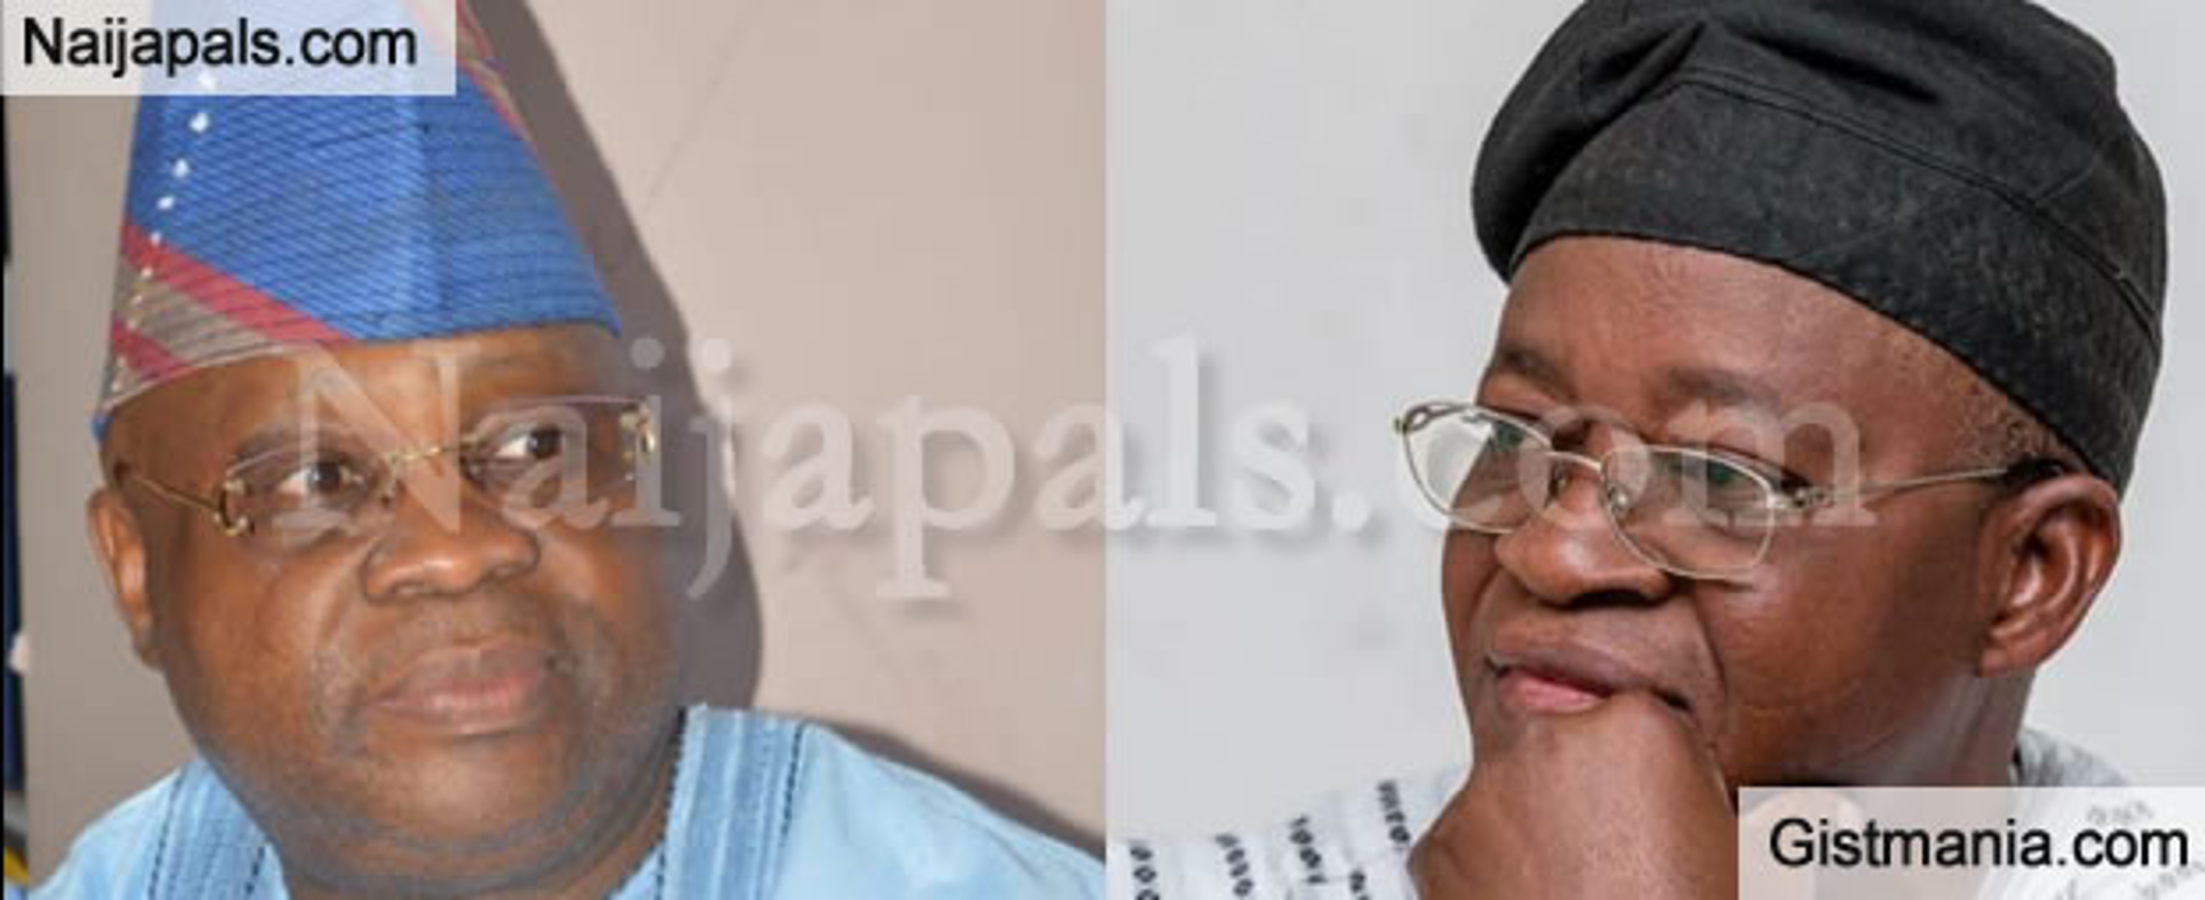 It's Highly Ridiculous Contesting Election With 'Dancer' - Oyetola Mocks Adeleke